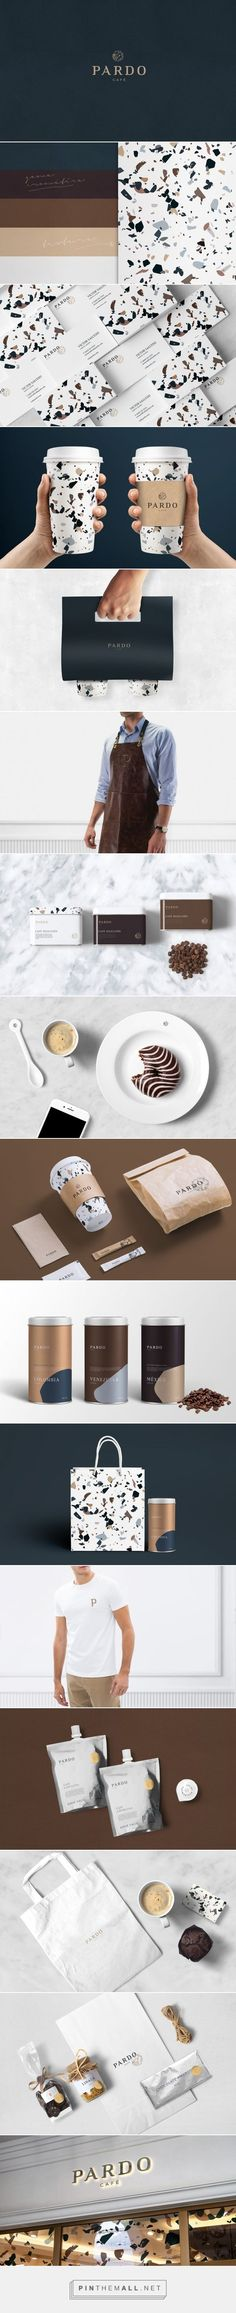 Pardo Cafe Branding and Packaging by Slavador Munca | Fivestar Branding Agency – Design and Branding Agency & Curated Inspiration Gallery